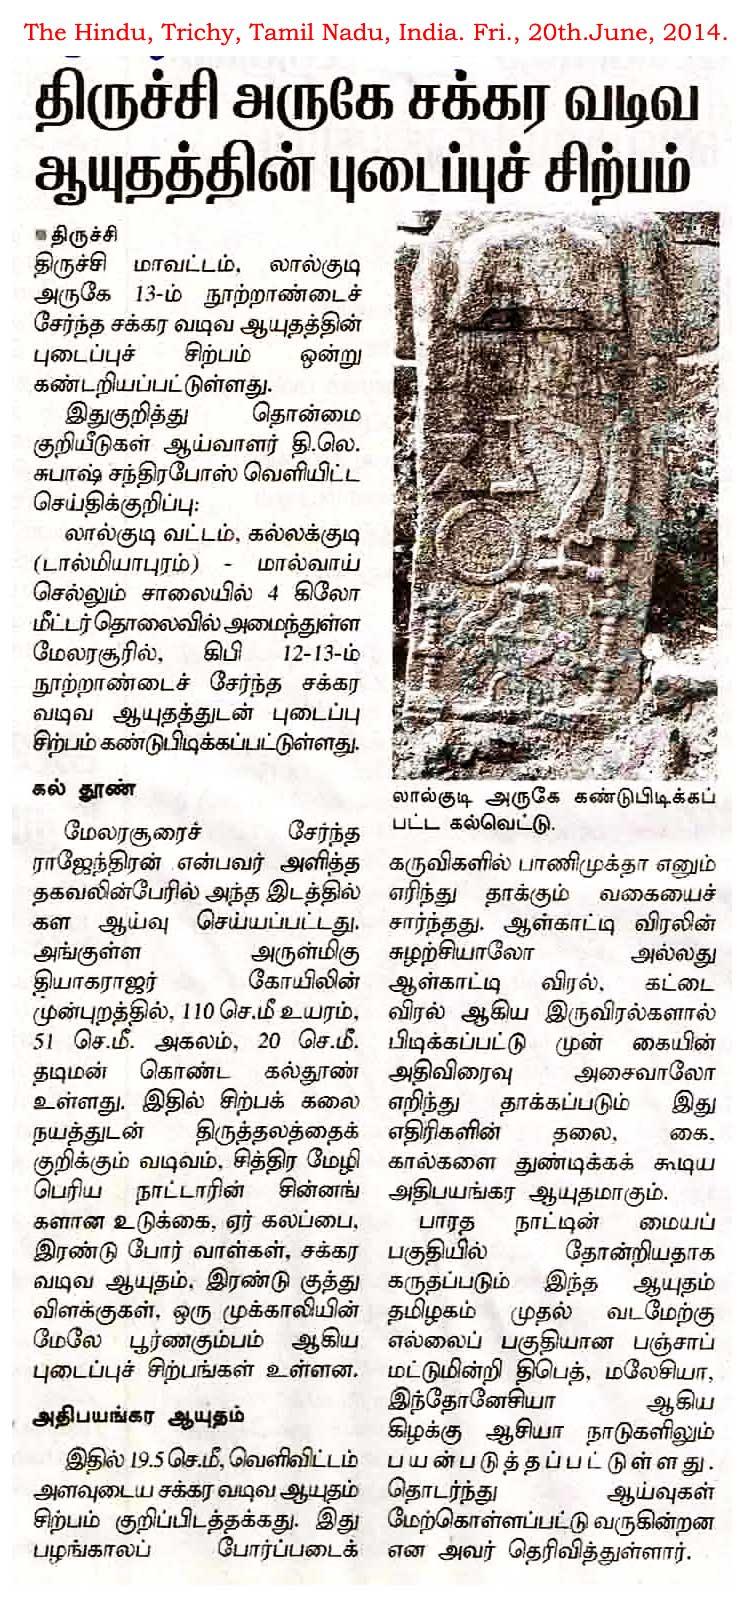 The-Hindu-Tamil - World Mysteries Blog